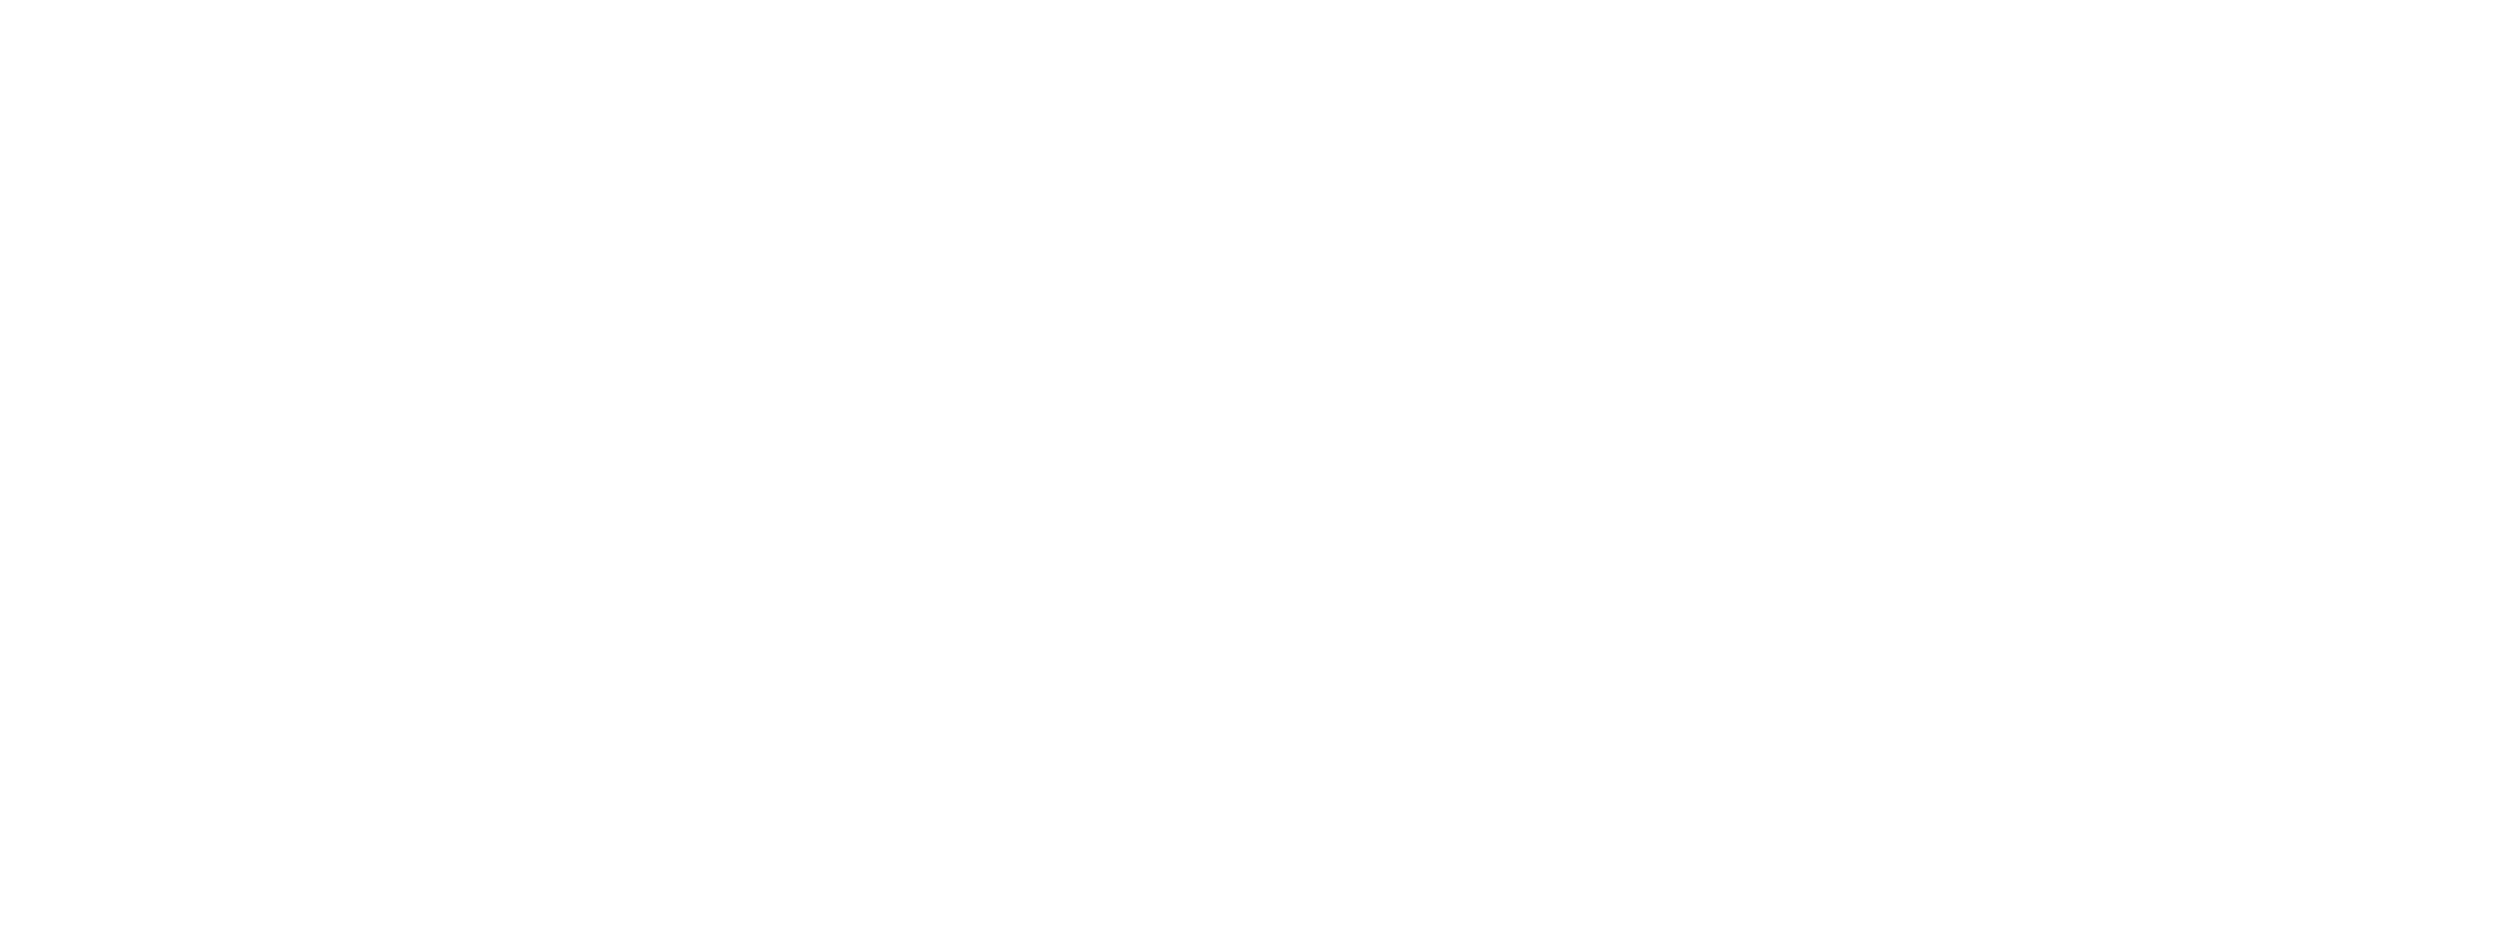 Tick Factory